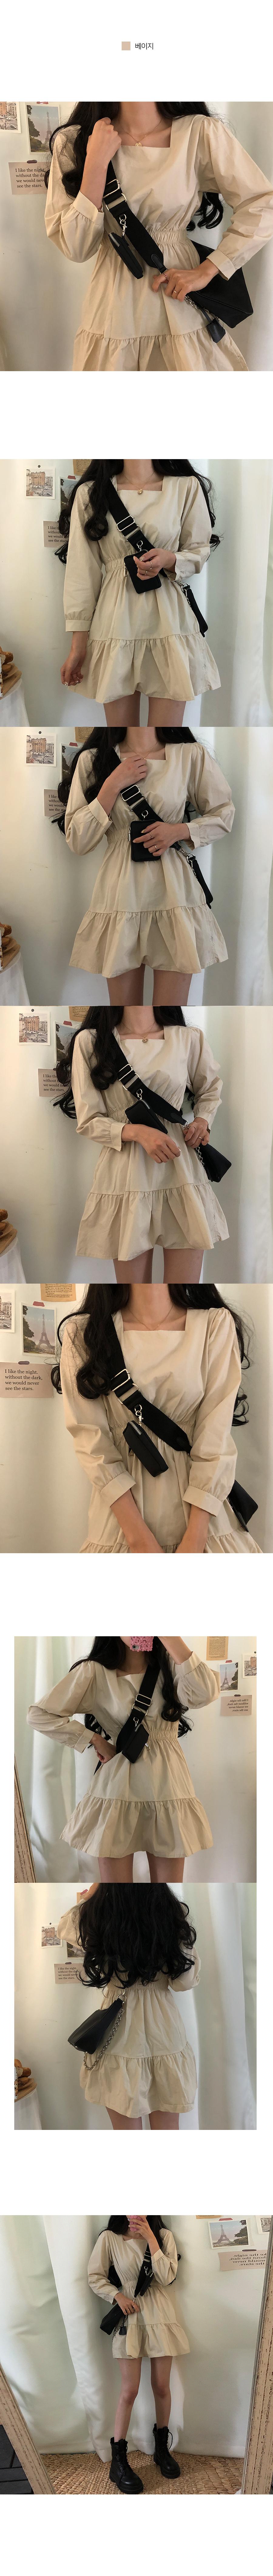 Dahlia Square Neck Cancan Mini Dress